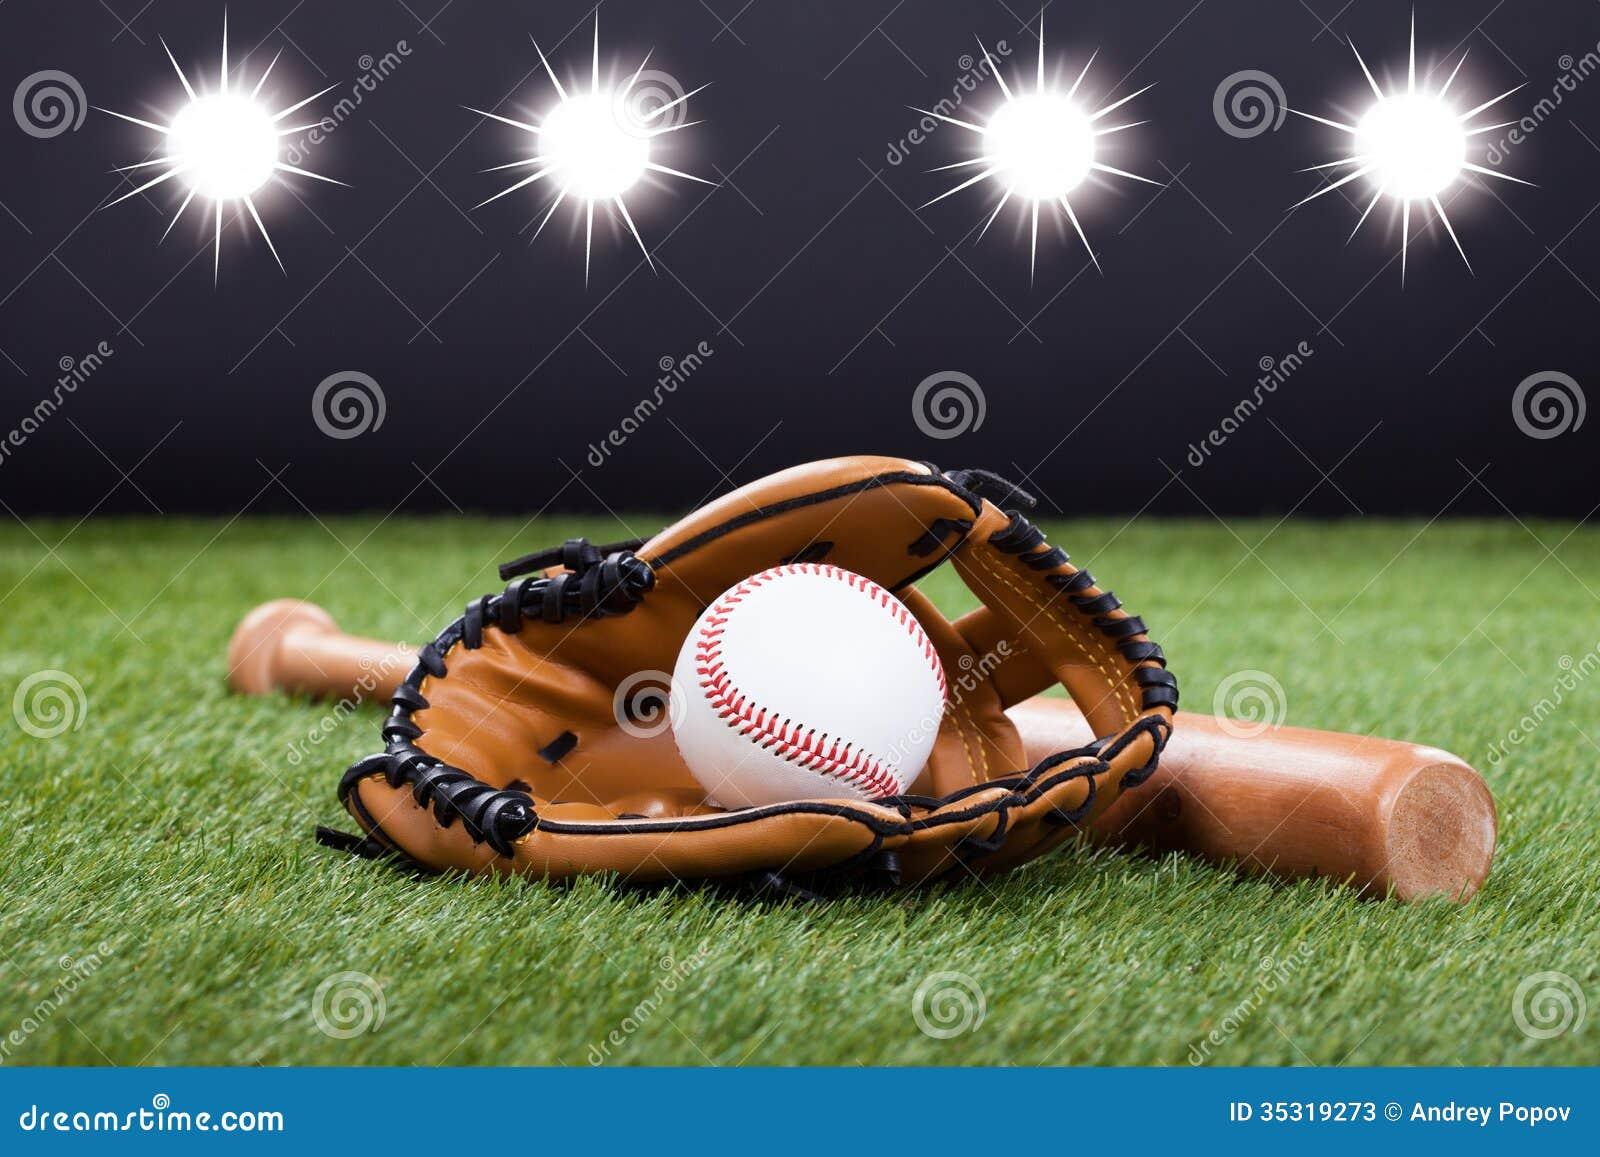 how to work in a baseball glove